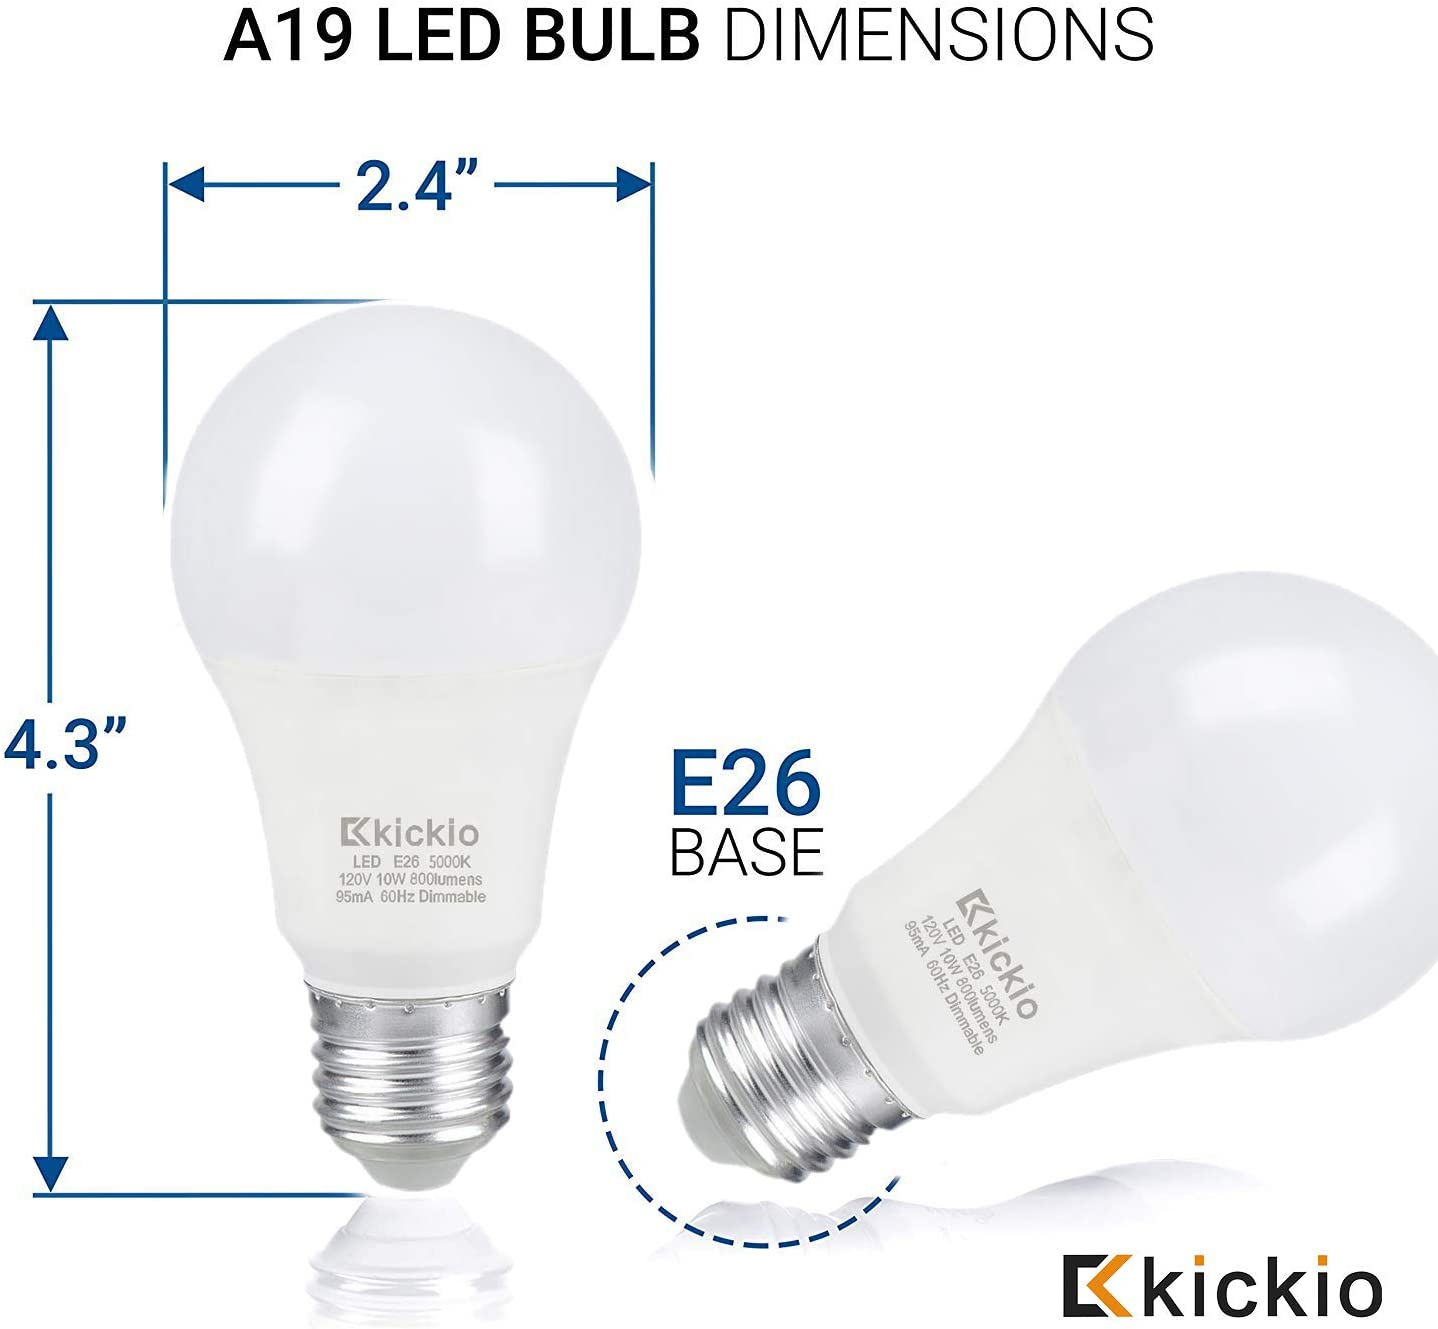 Kickio A19 Led Light Bulbs 10 Watt 800 Lumens 60 Watt Equivalent Dimmable 5000K Daylight White UL Listed E26 Medium Base Pack of 10